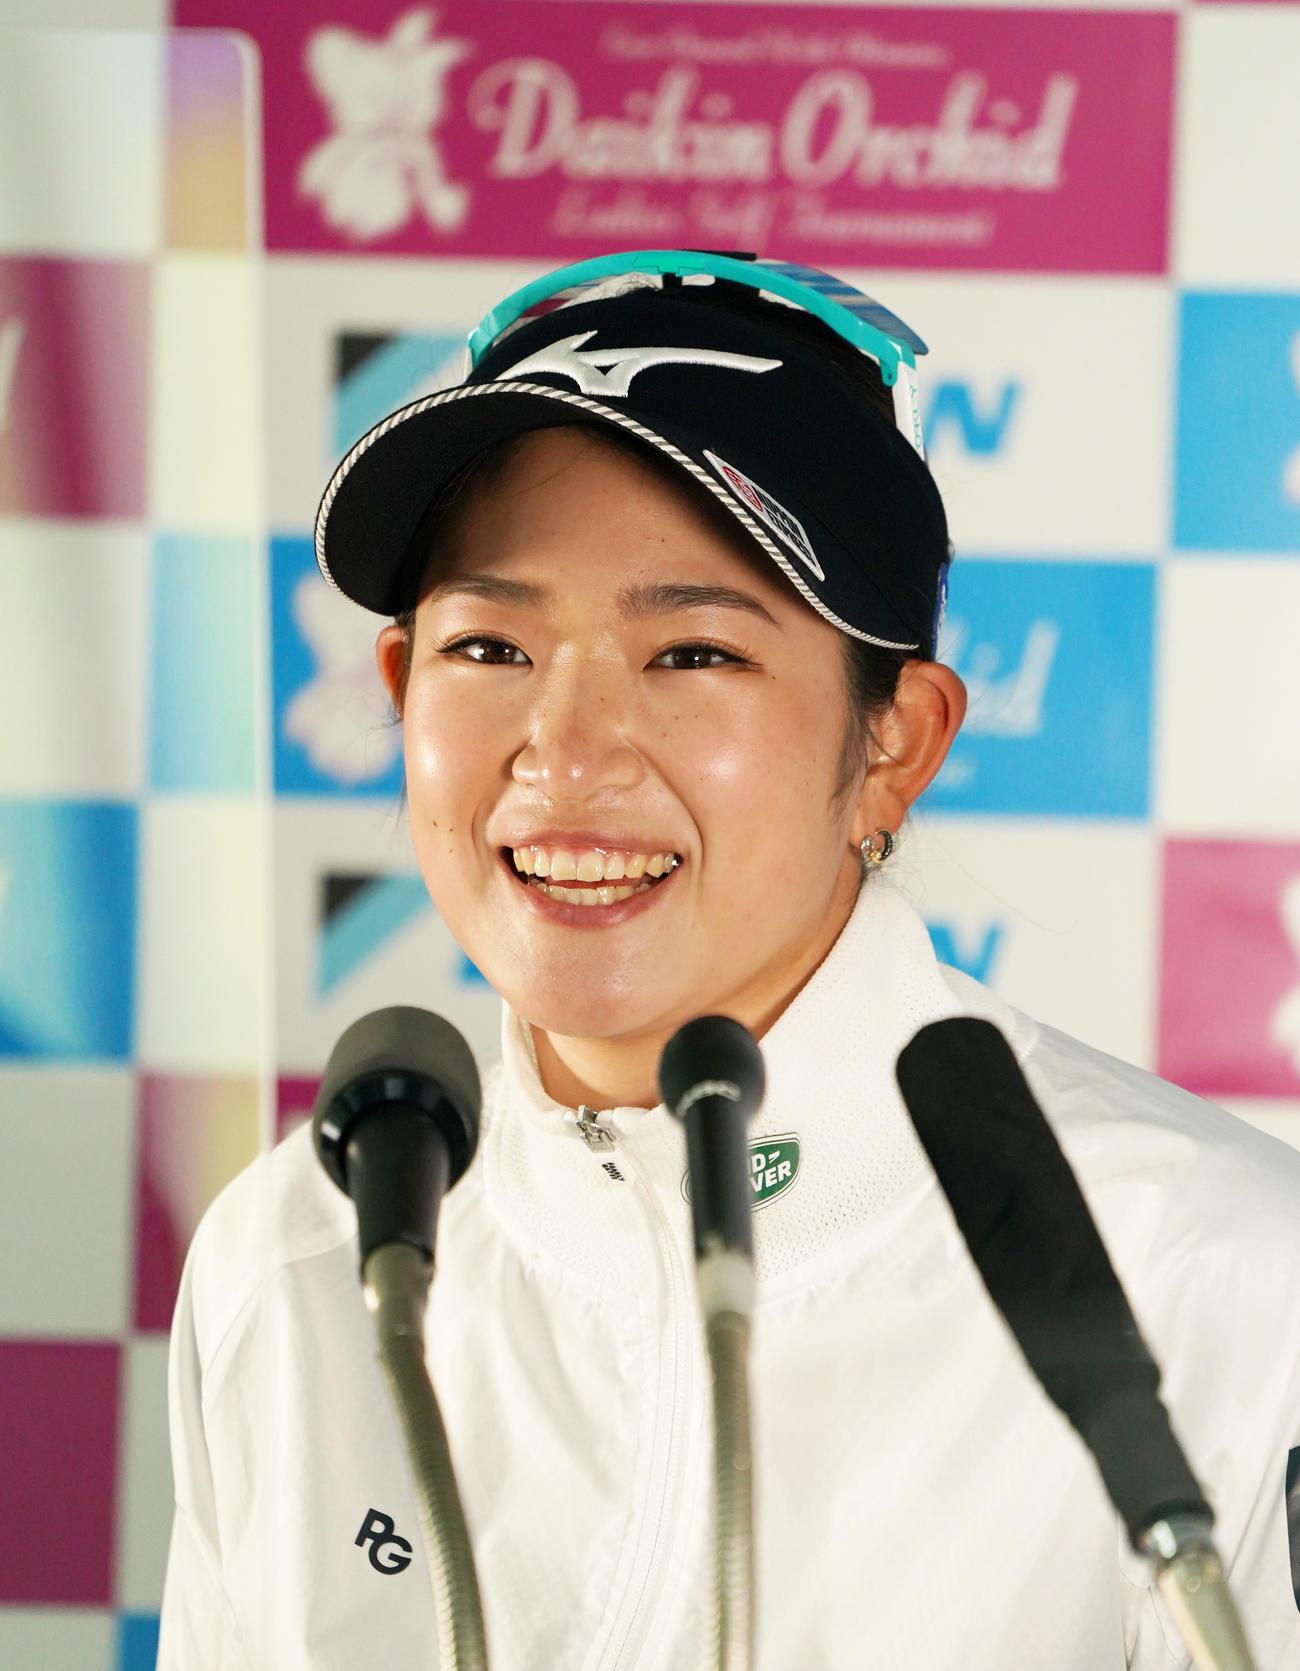 https://www.nikkansports.com/sports/golf/news/img/202103020000650-w1300_4.jpg